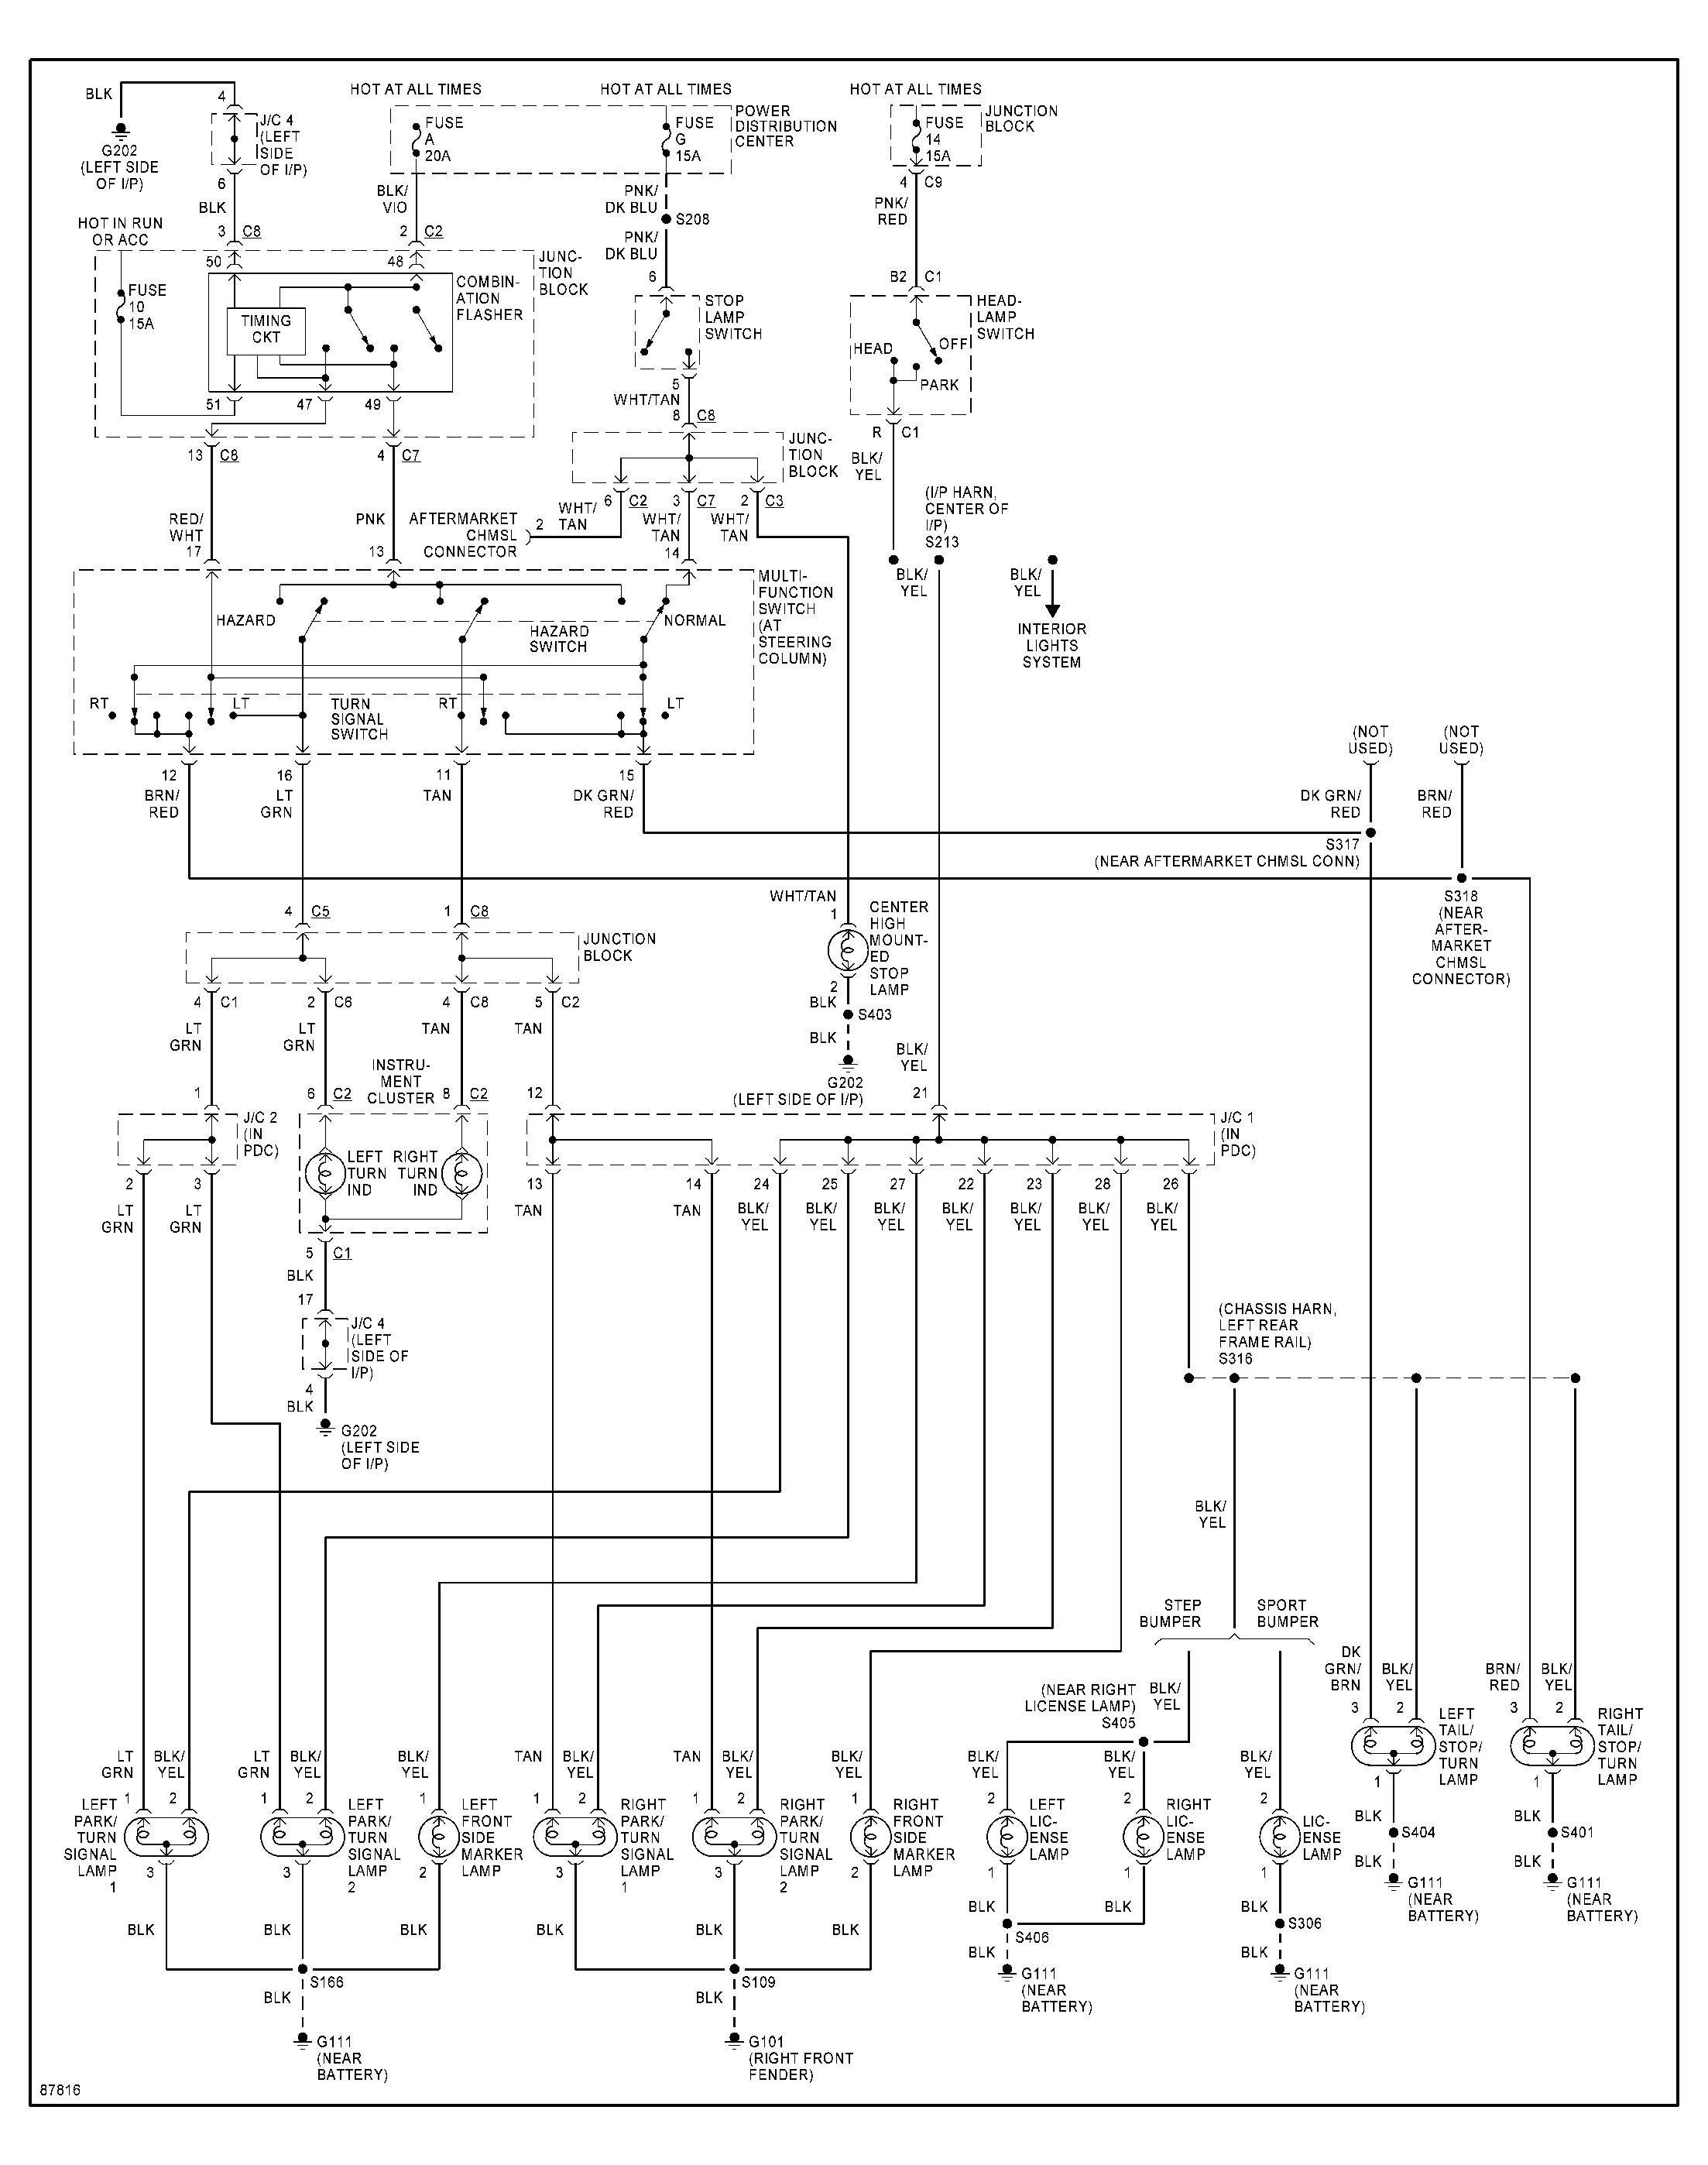 Dodge Durango Engine Diagram 10 Dodge Ram 1500 Engine Collections Of Dodge Durango Engine Diagram